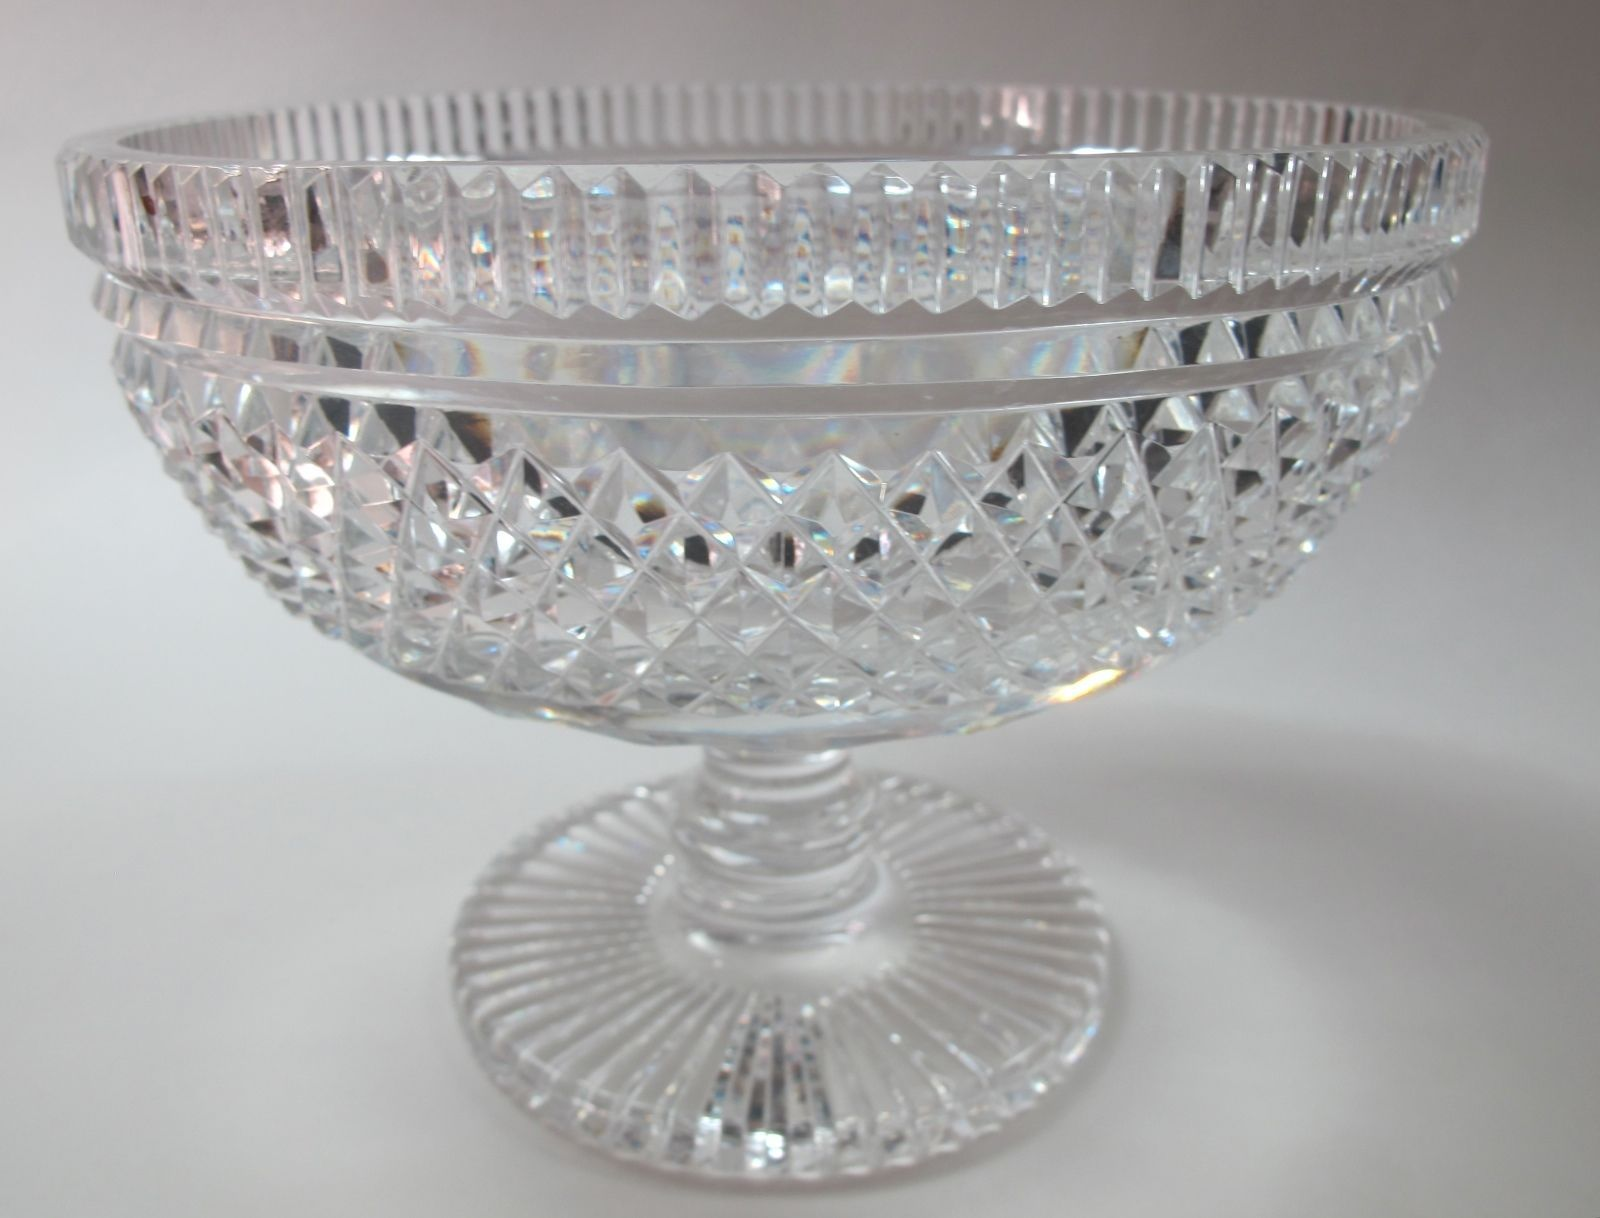 table pedestal plated en bowl malmaison silver accessories christofle